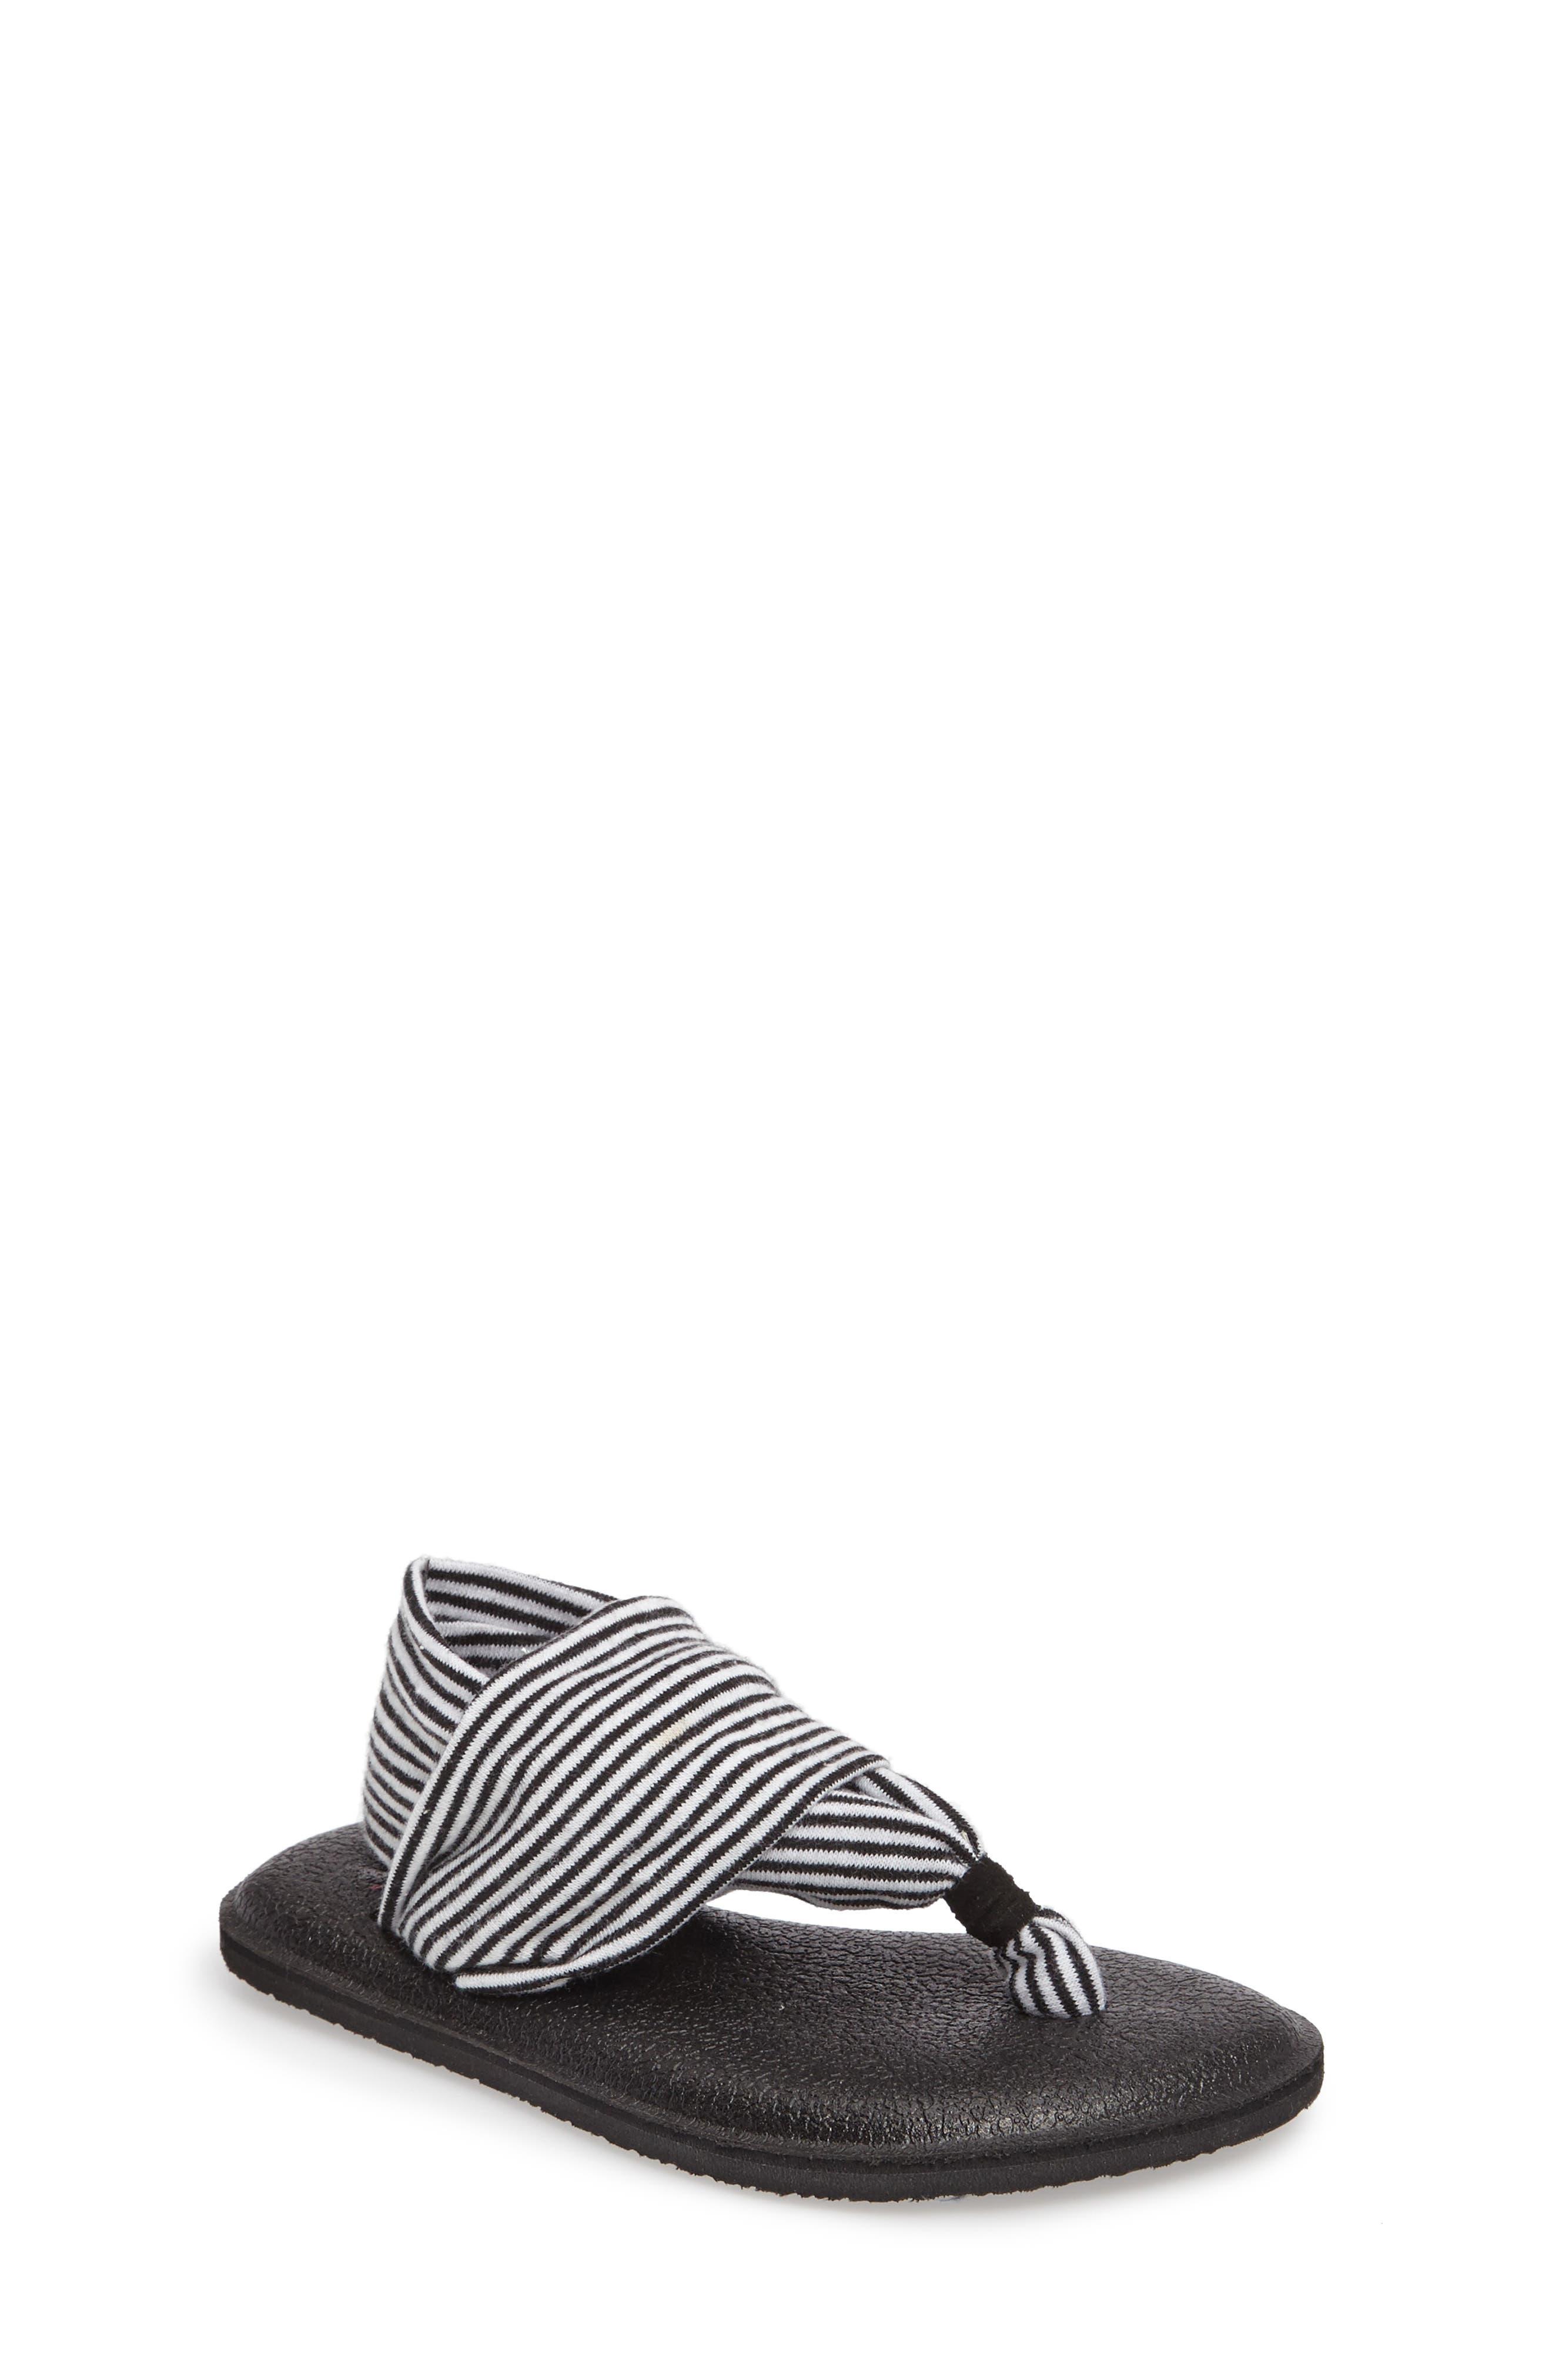 'Yoga Sling' Sandal,                         Main,                         color, BLACK/ WHITE STRIPE